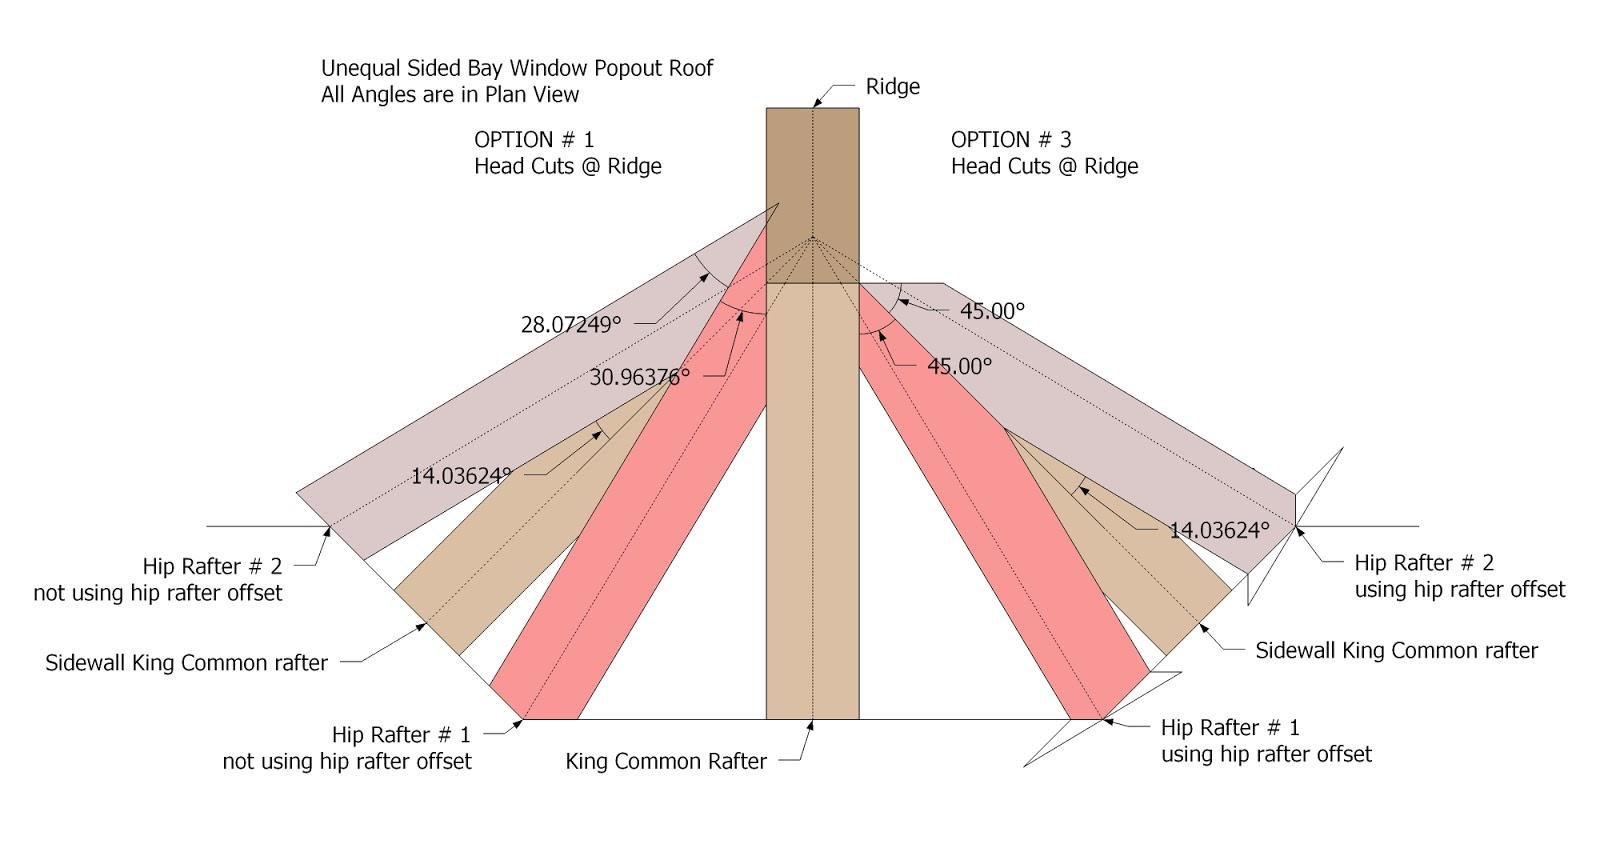 Roof Framing Geometry: California Bay Window Hip Rafter Head Cuts